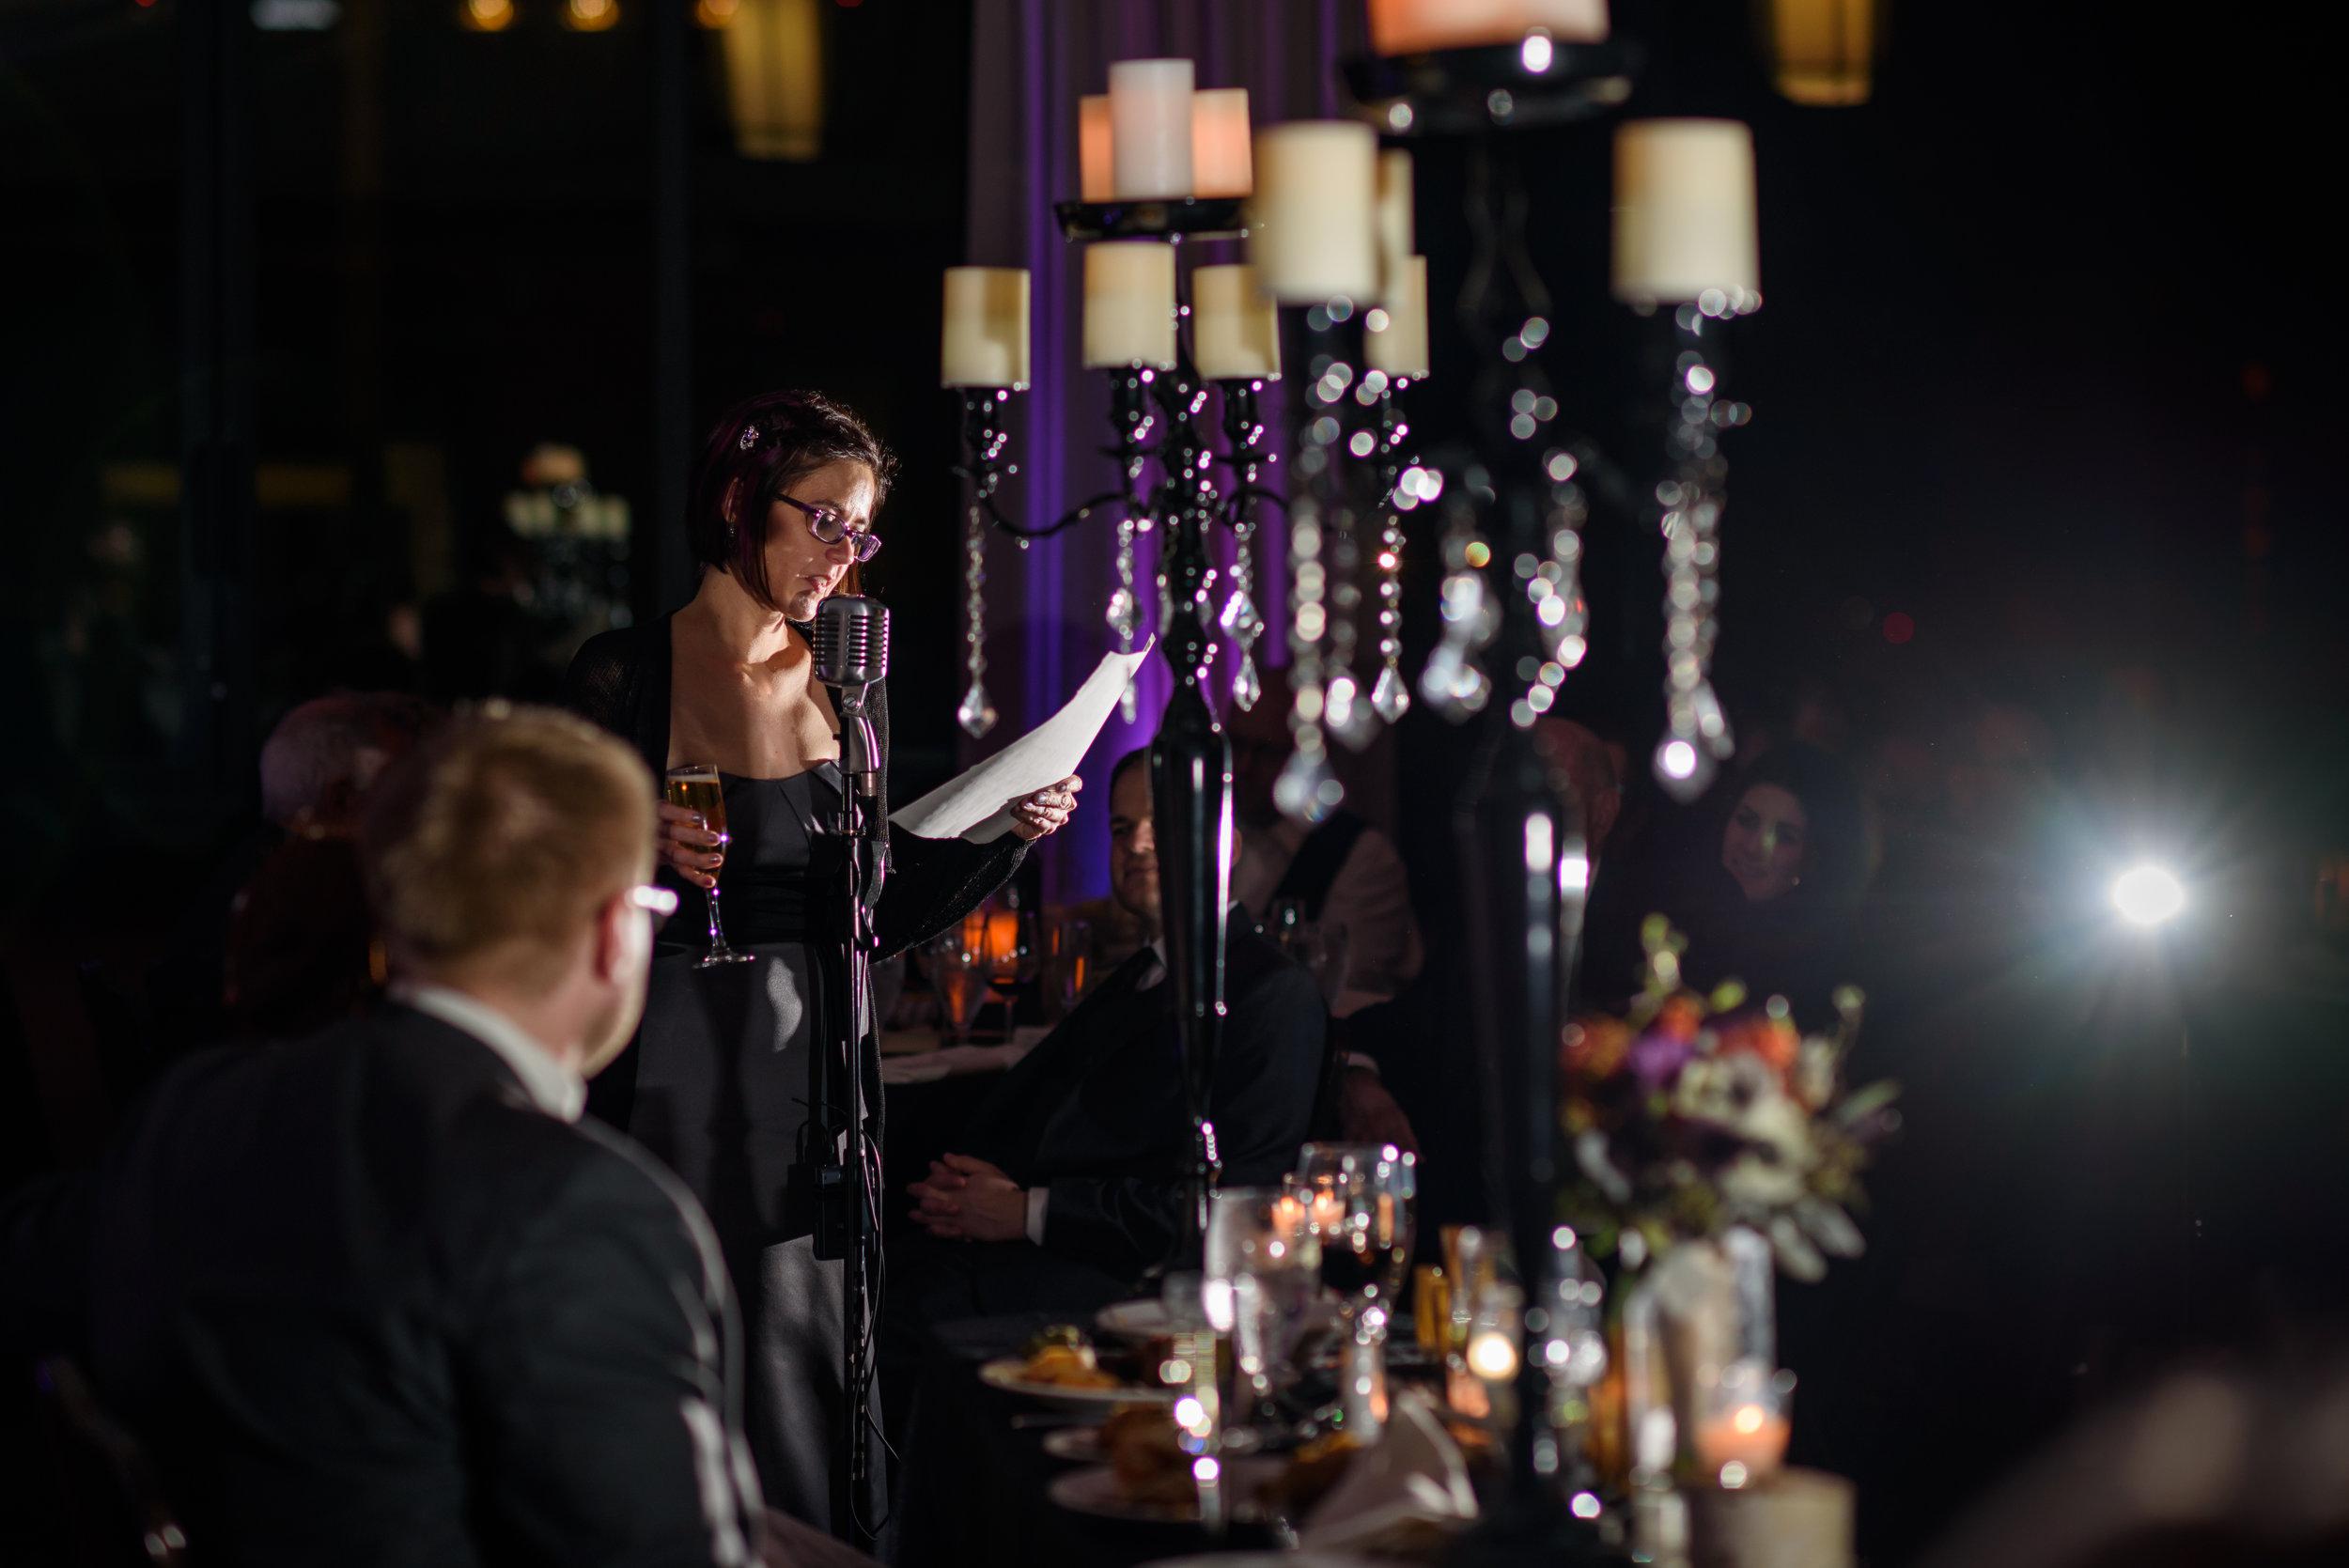 judith-john-003-citizen-hotel-sacramento-wedding-photographer-katherine-nicole-photography.JPG